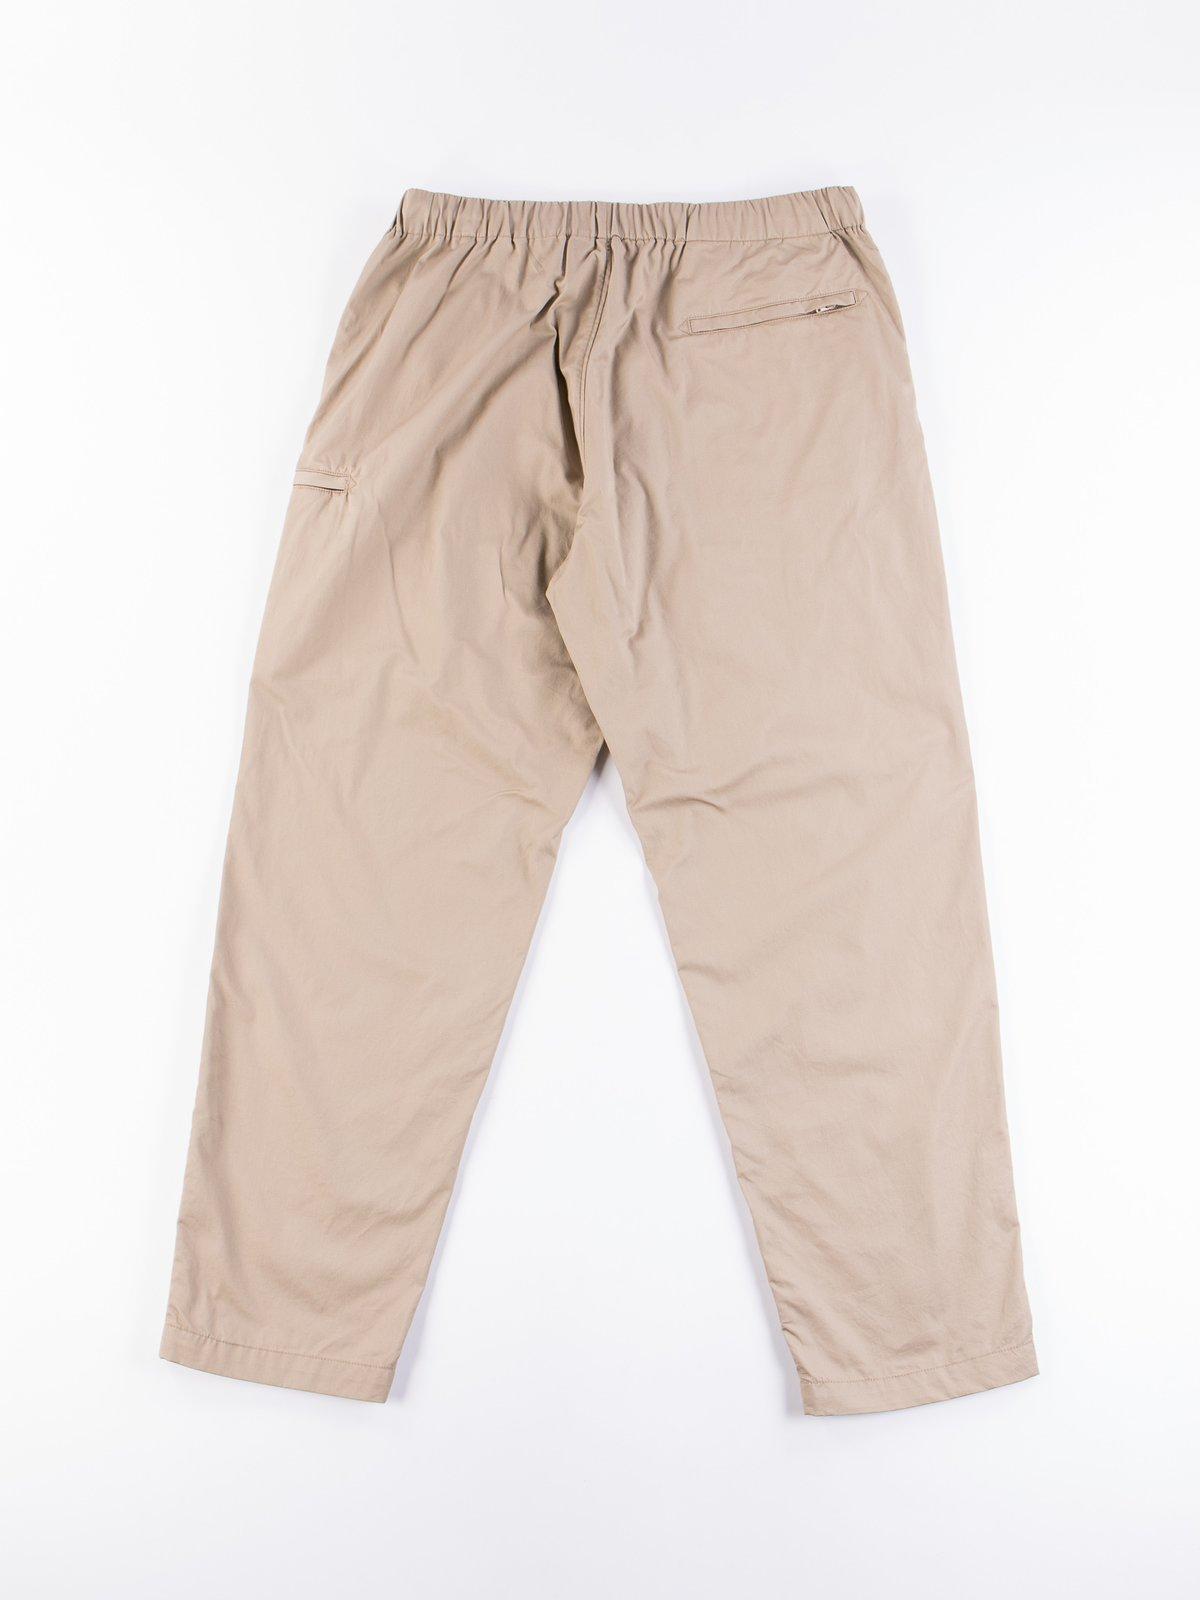 Khaki Highcount Twill Drawstring Pant - Image 5